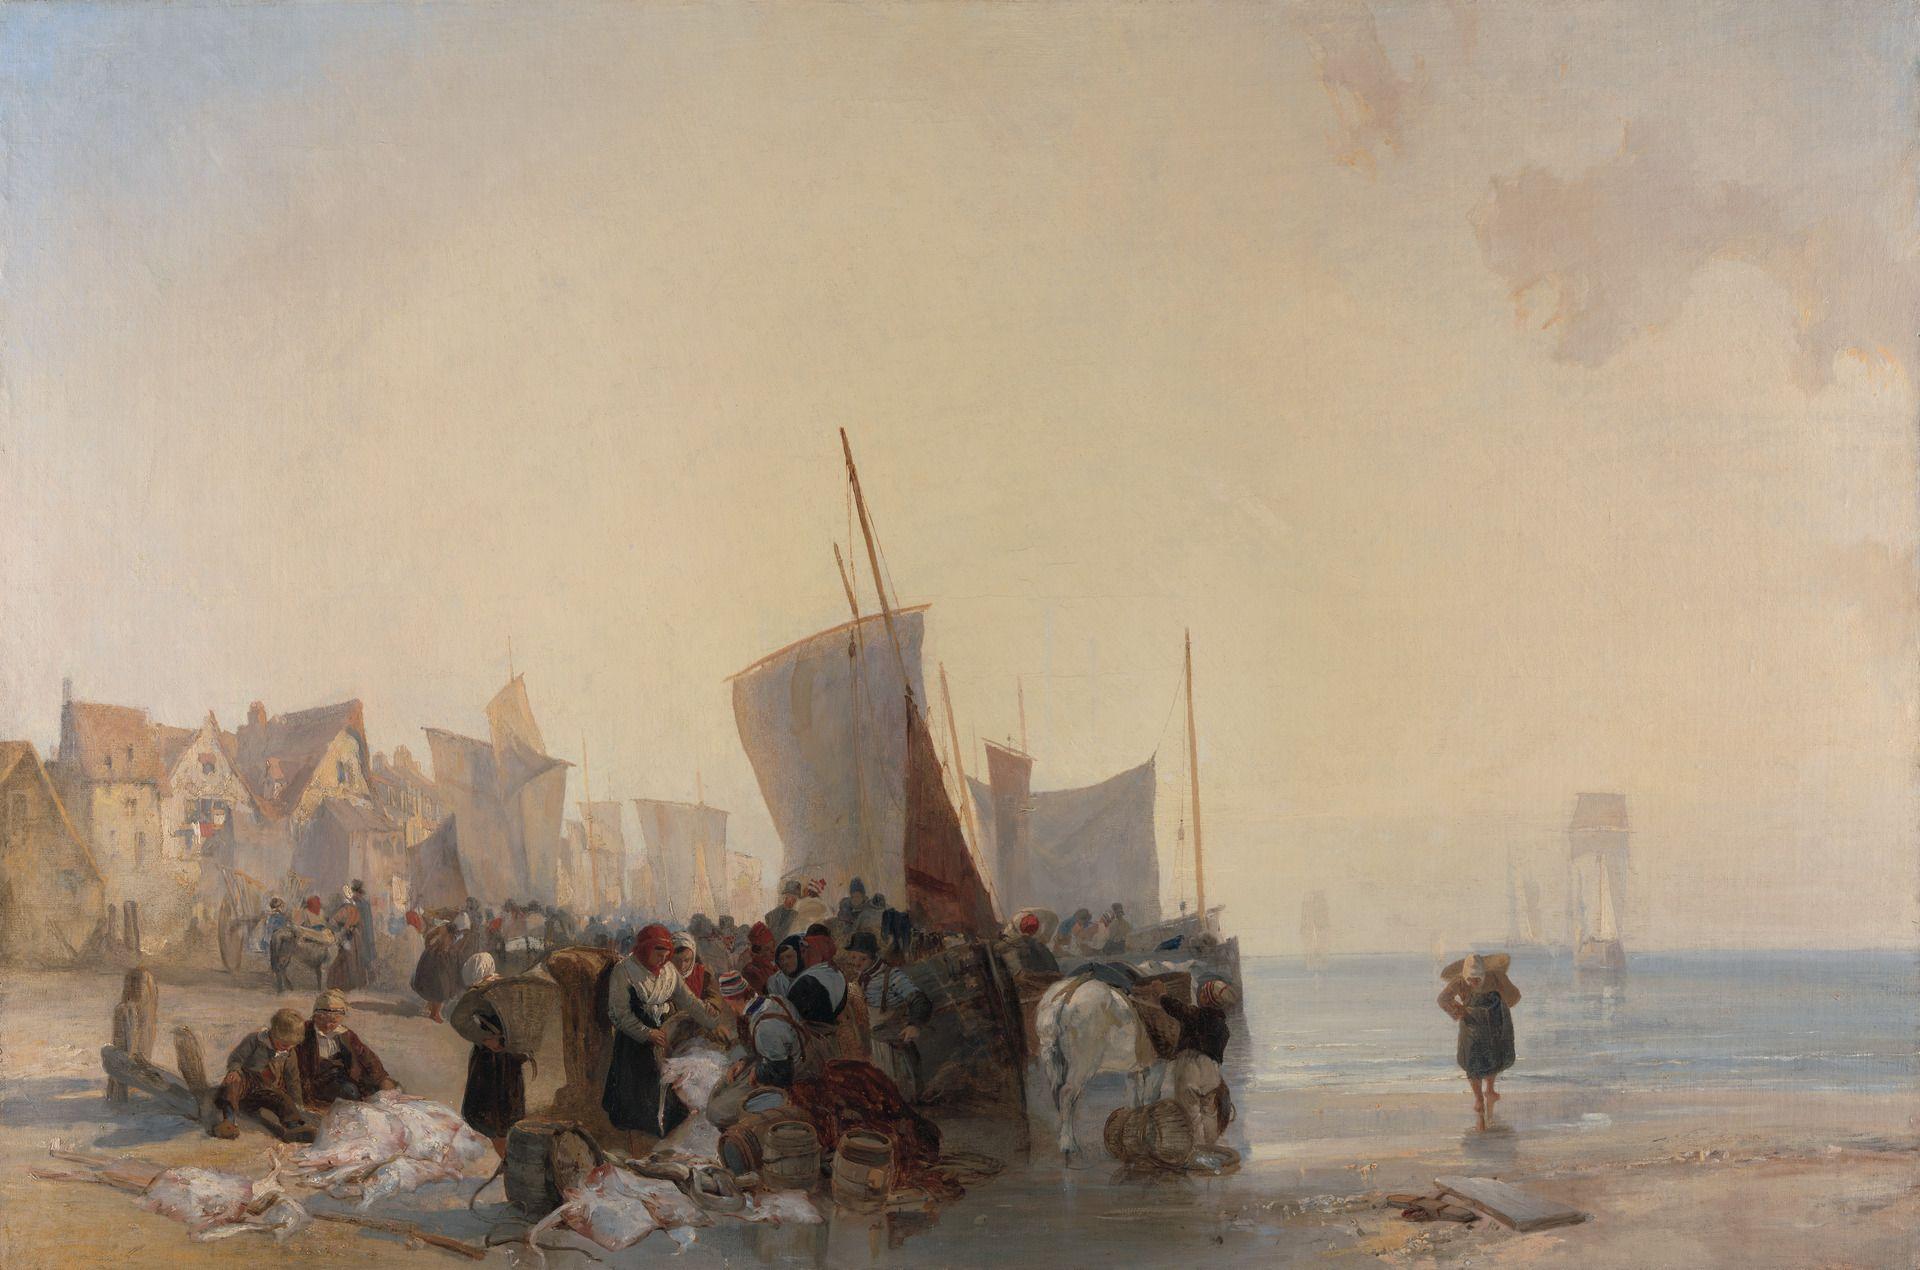 A Fish Market near Boulogne | Richard Parkes Bonington | Oil Painting